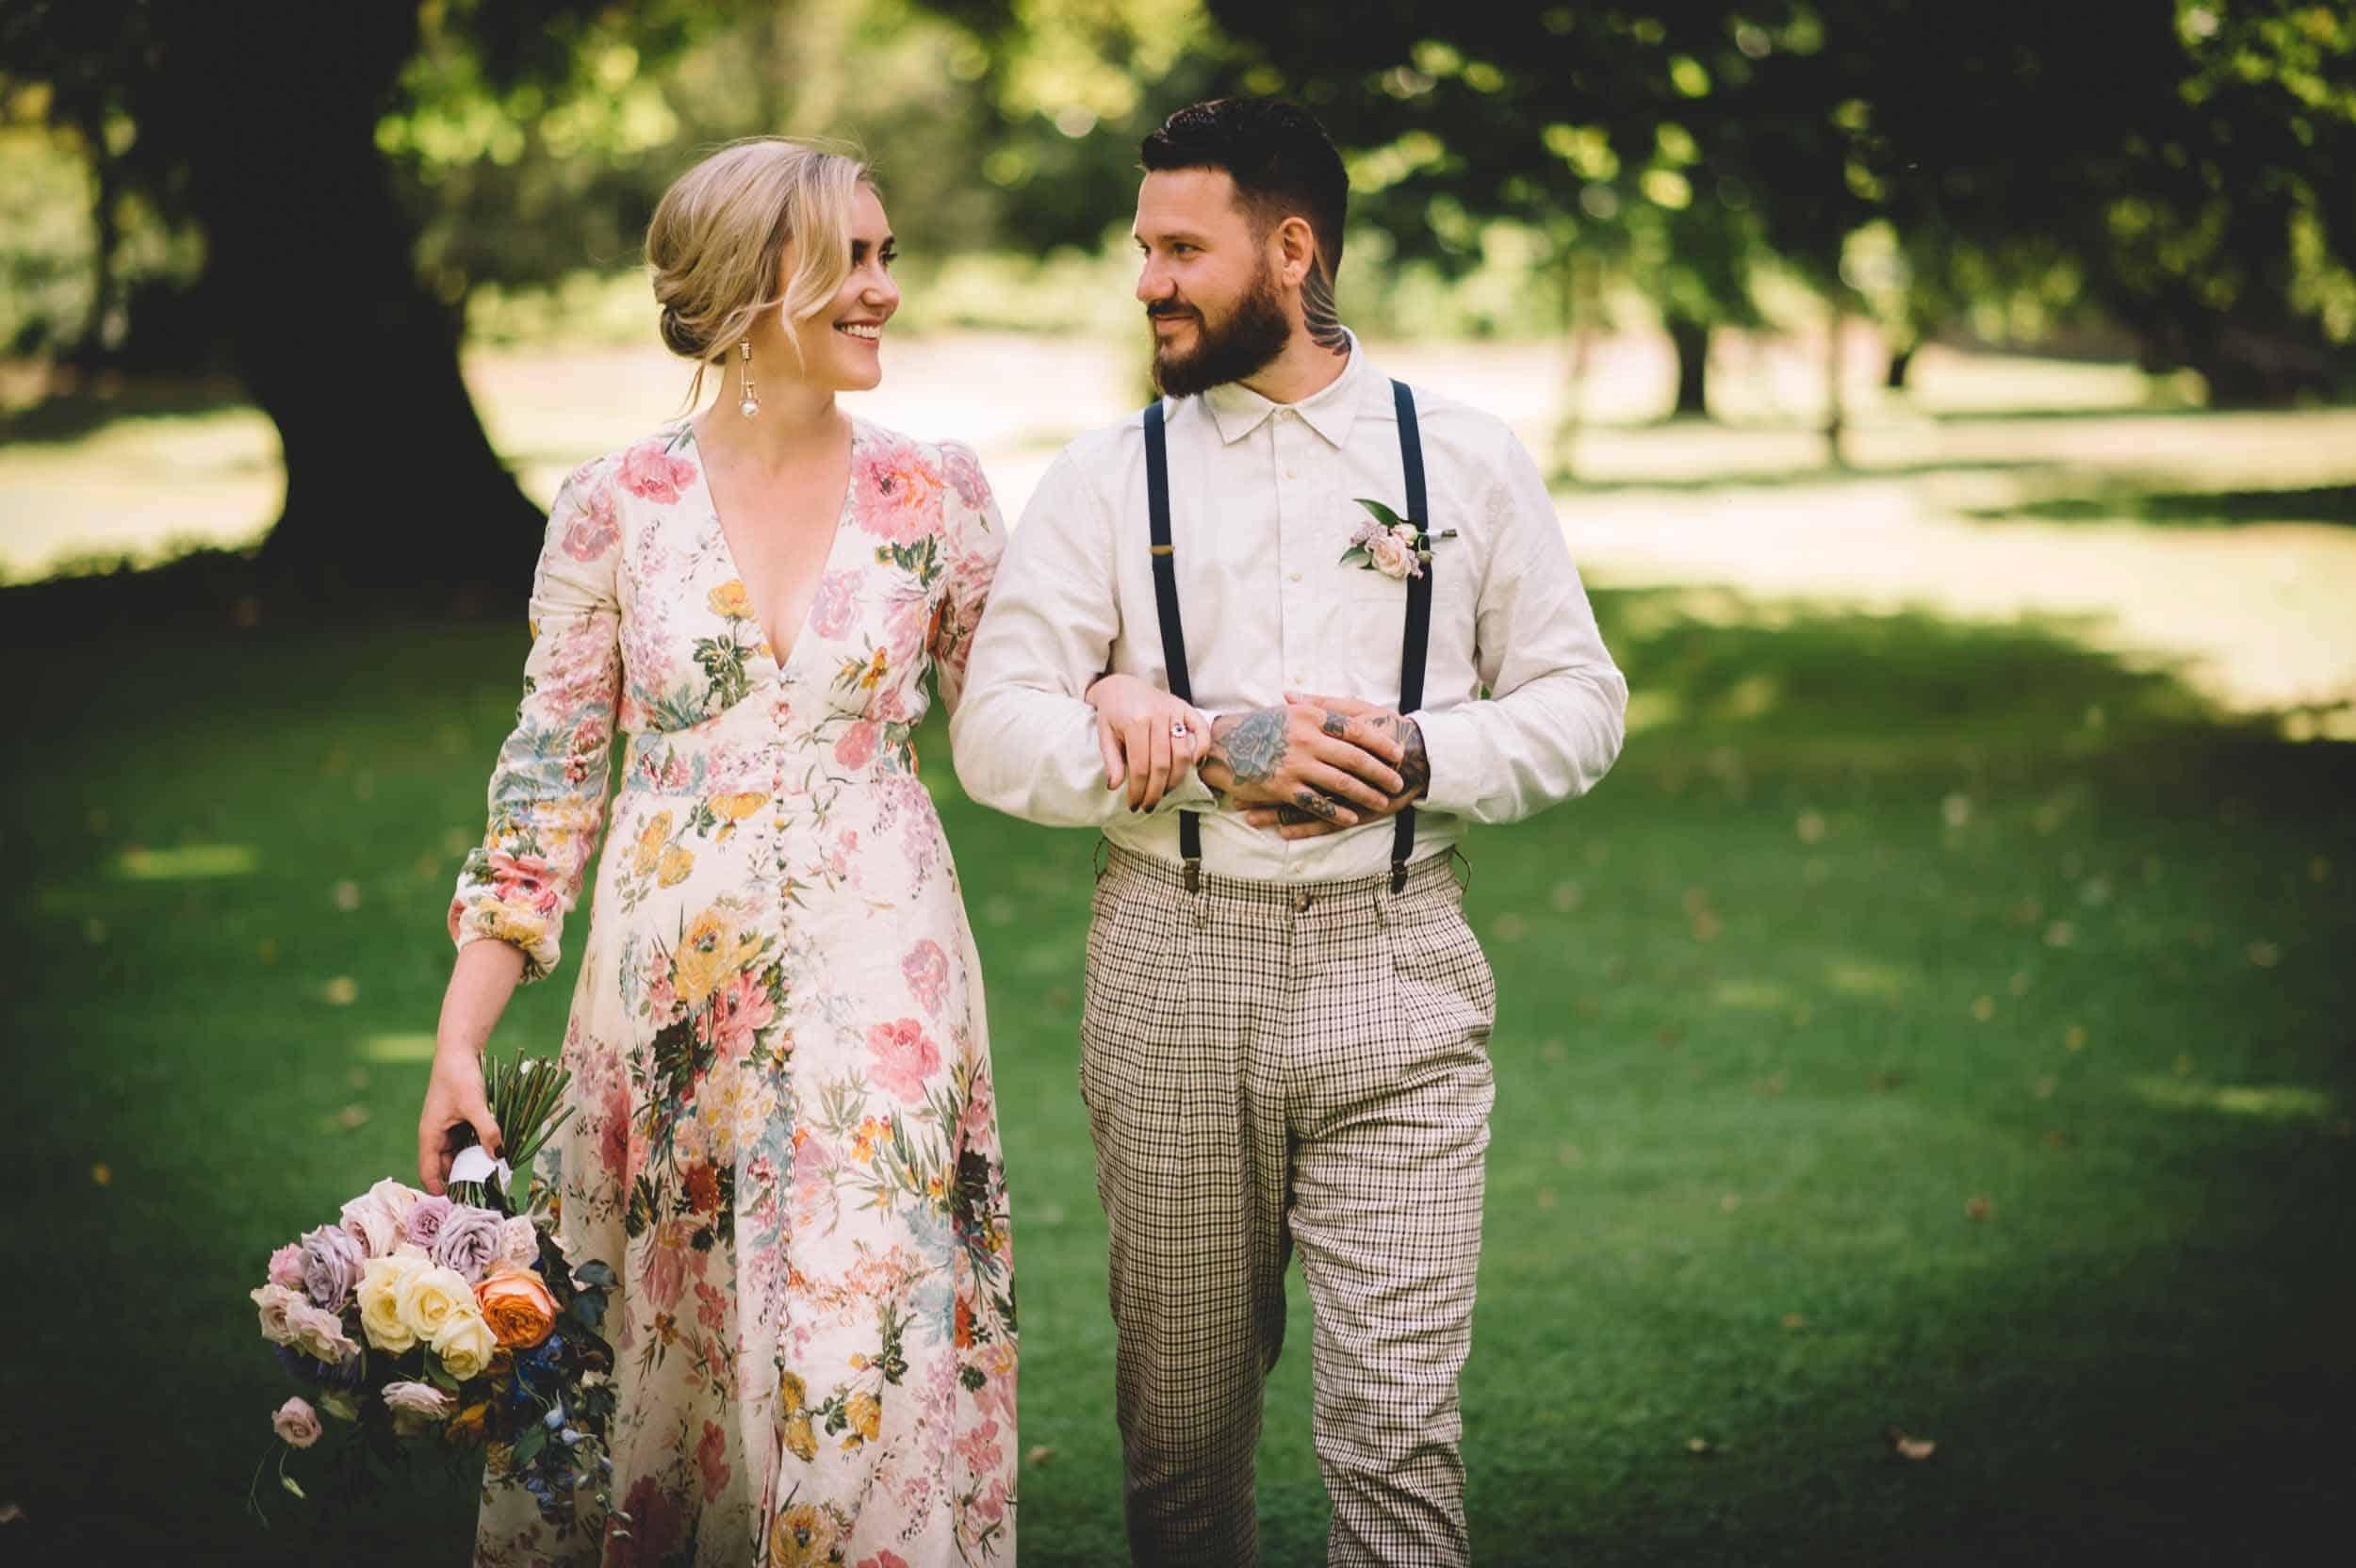 Nick & Nina's Thurlby Domain Elopement bride & groom photos